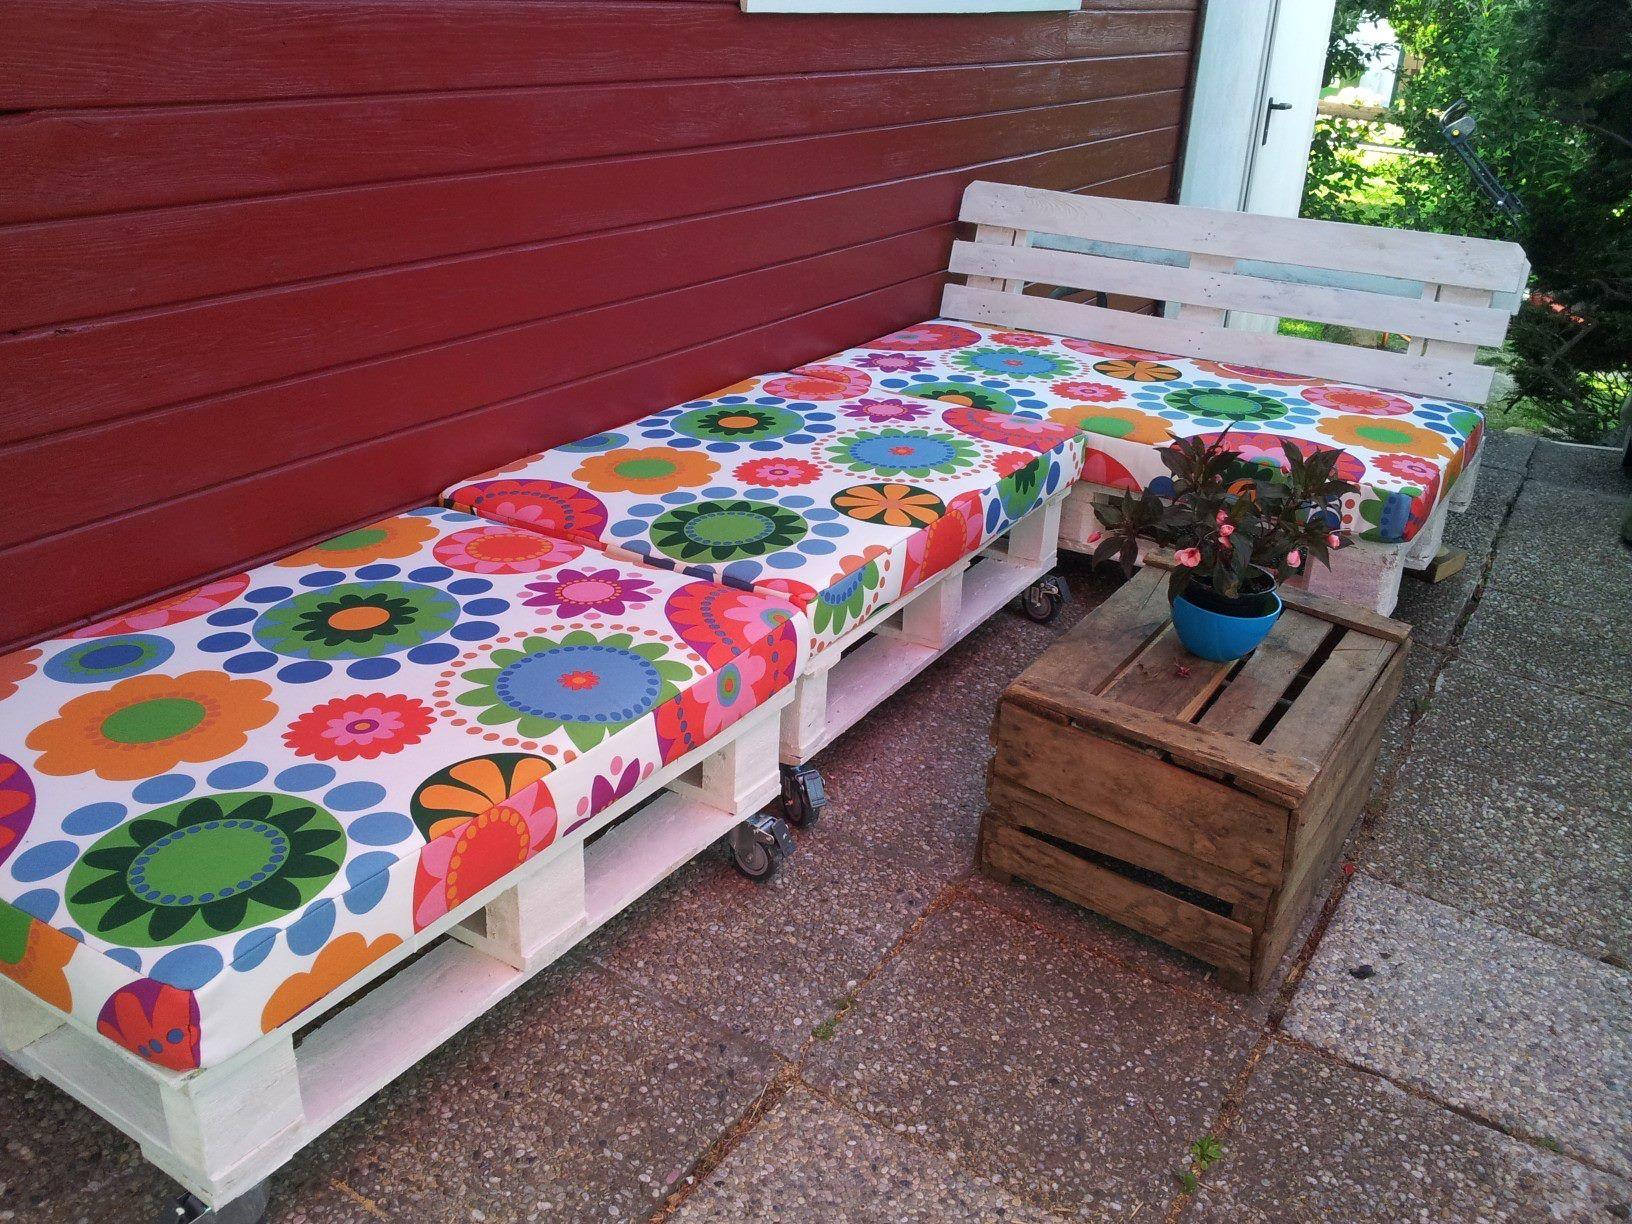 Sofá florido #handmade #hecho a mano #hecho con palets #pallet #palet #sofa de palets